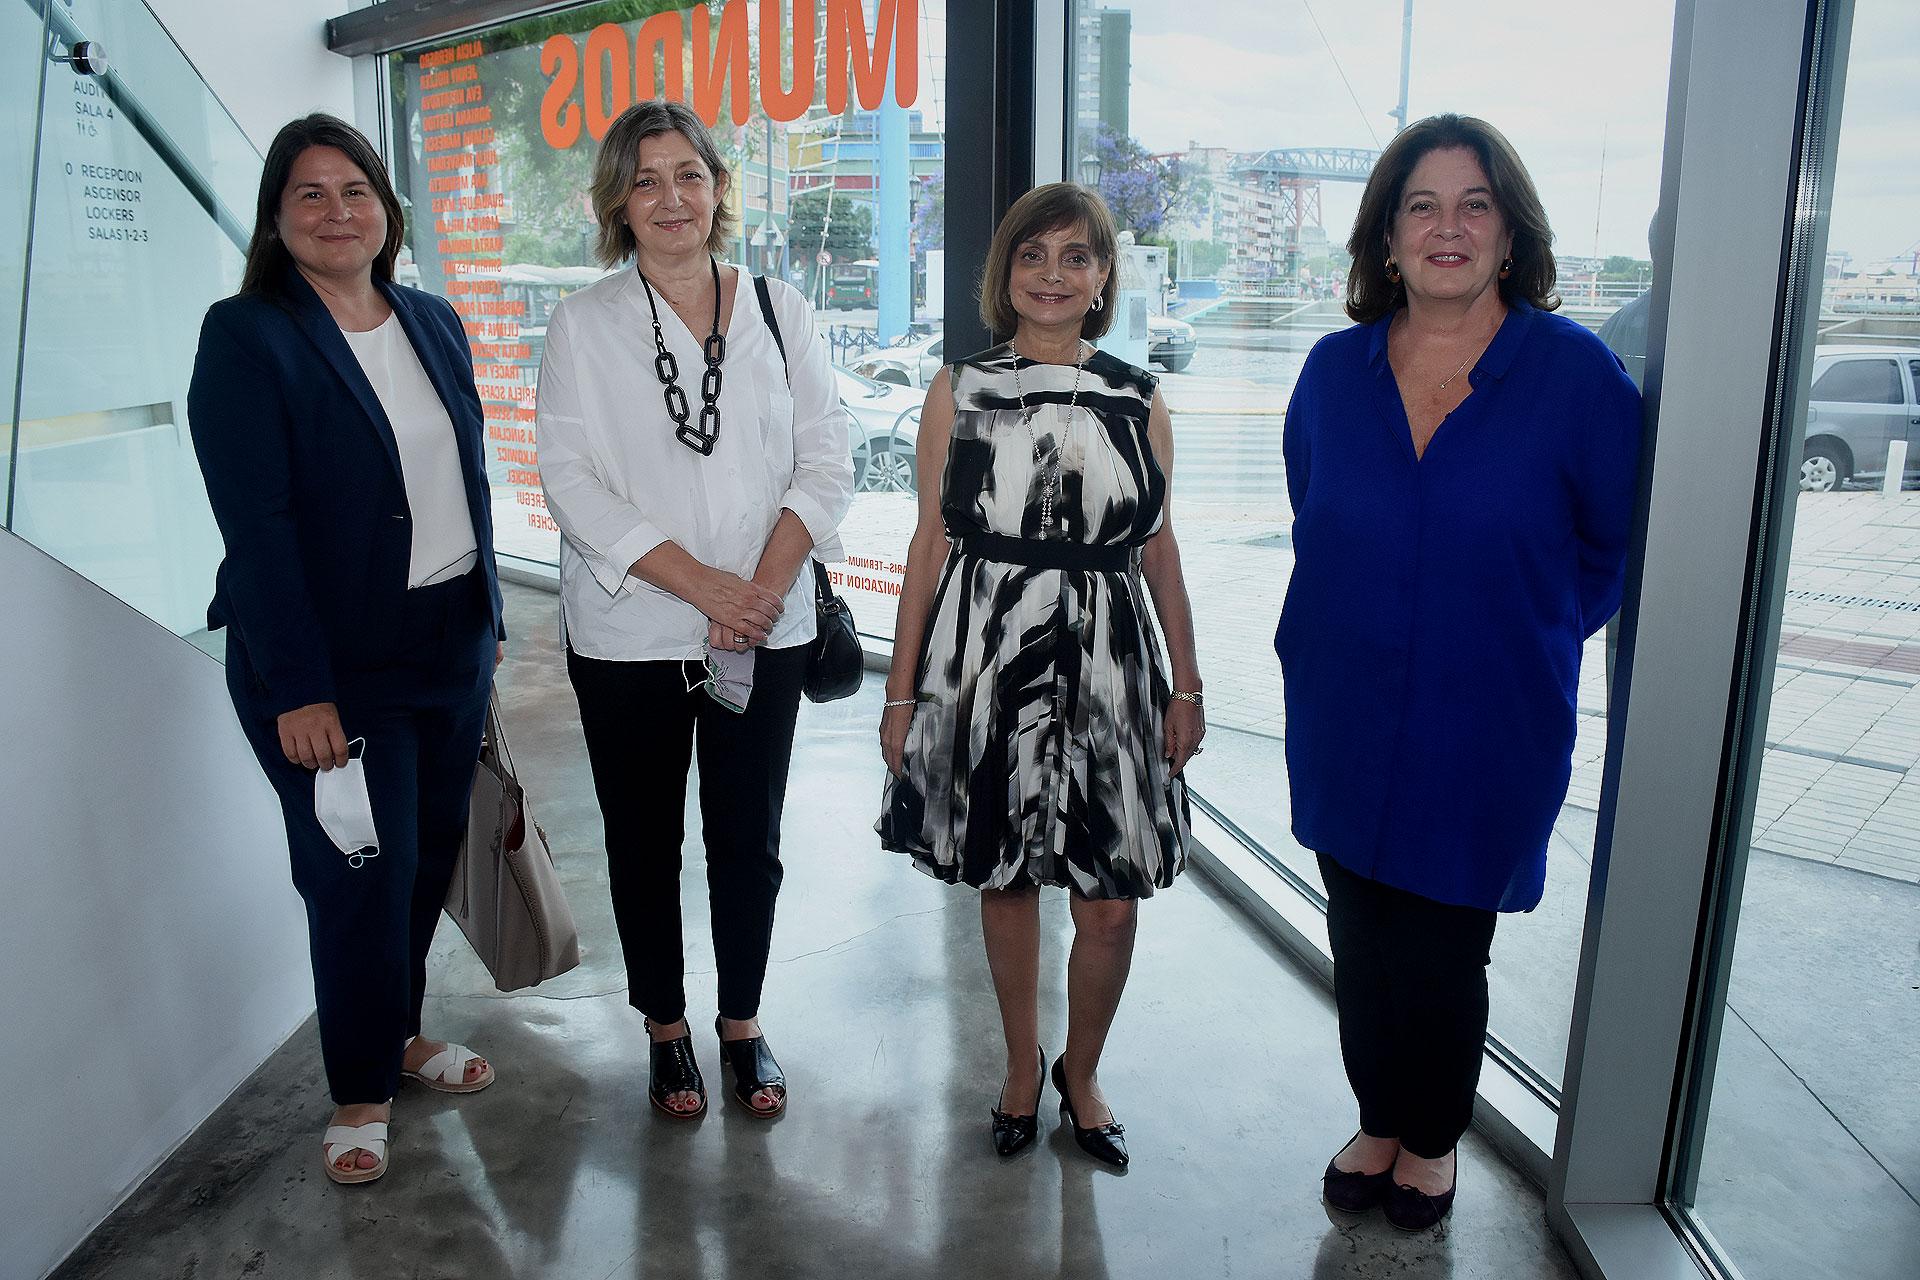 Romina Andreani, Adriana Lorusso, Claudia Stad y Adriana Rosenberg